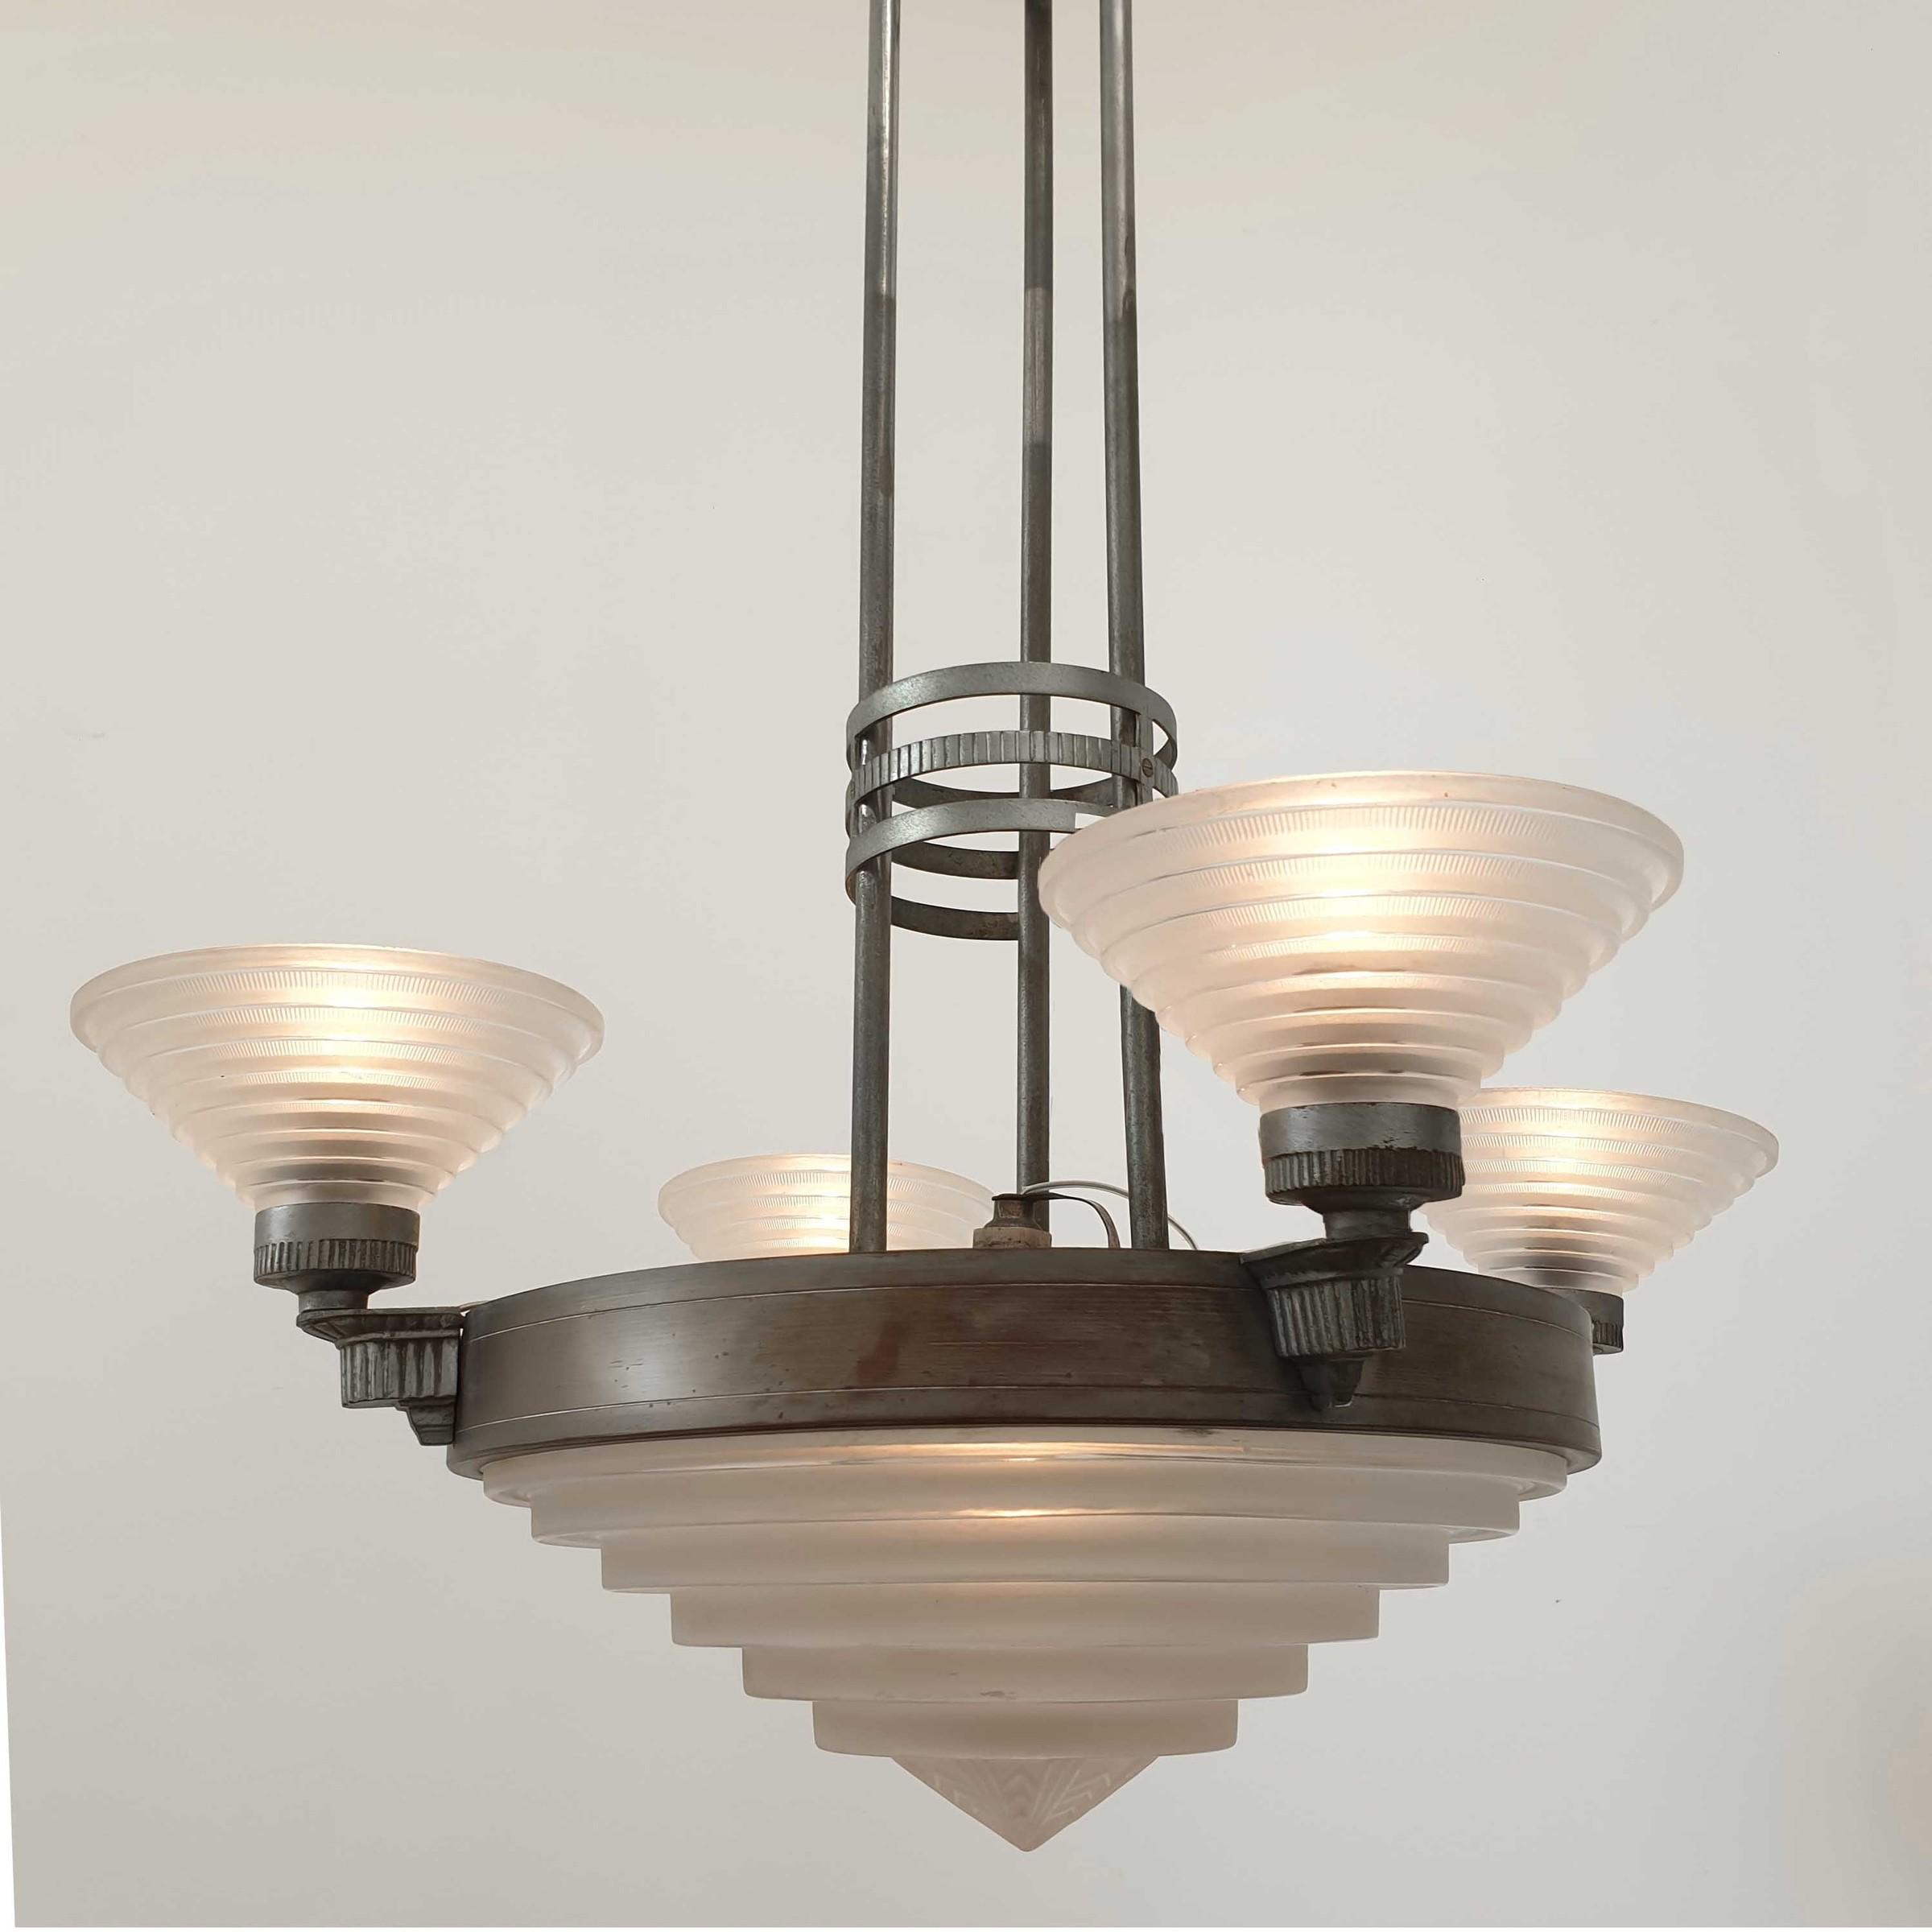 Art deco hanglamp door Jules Leleu